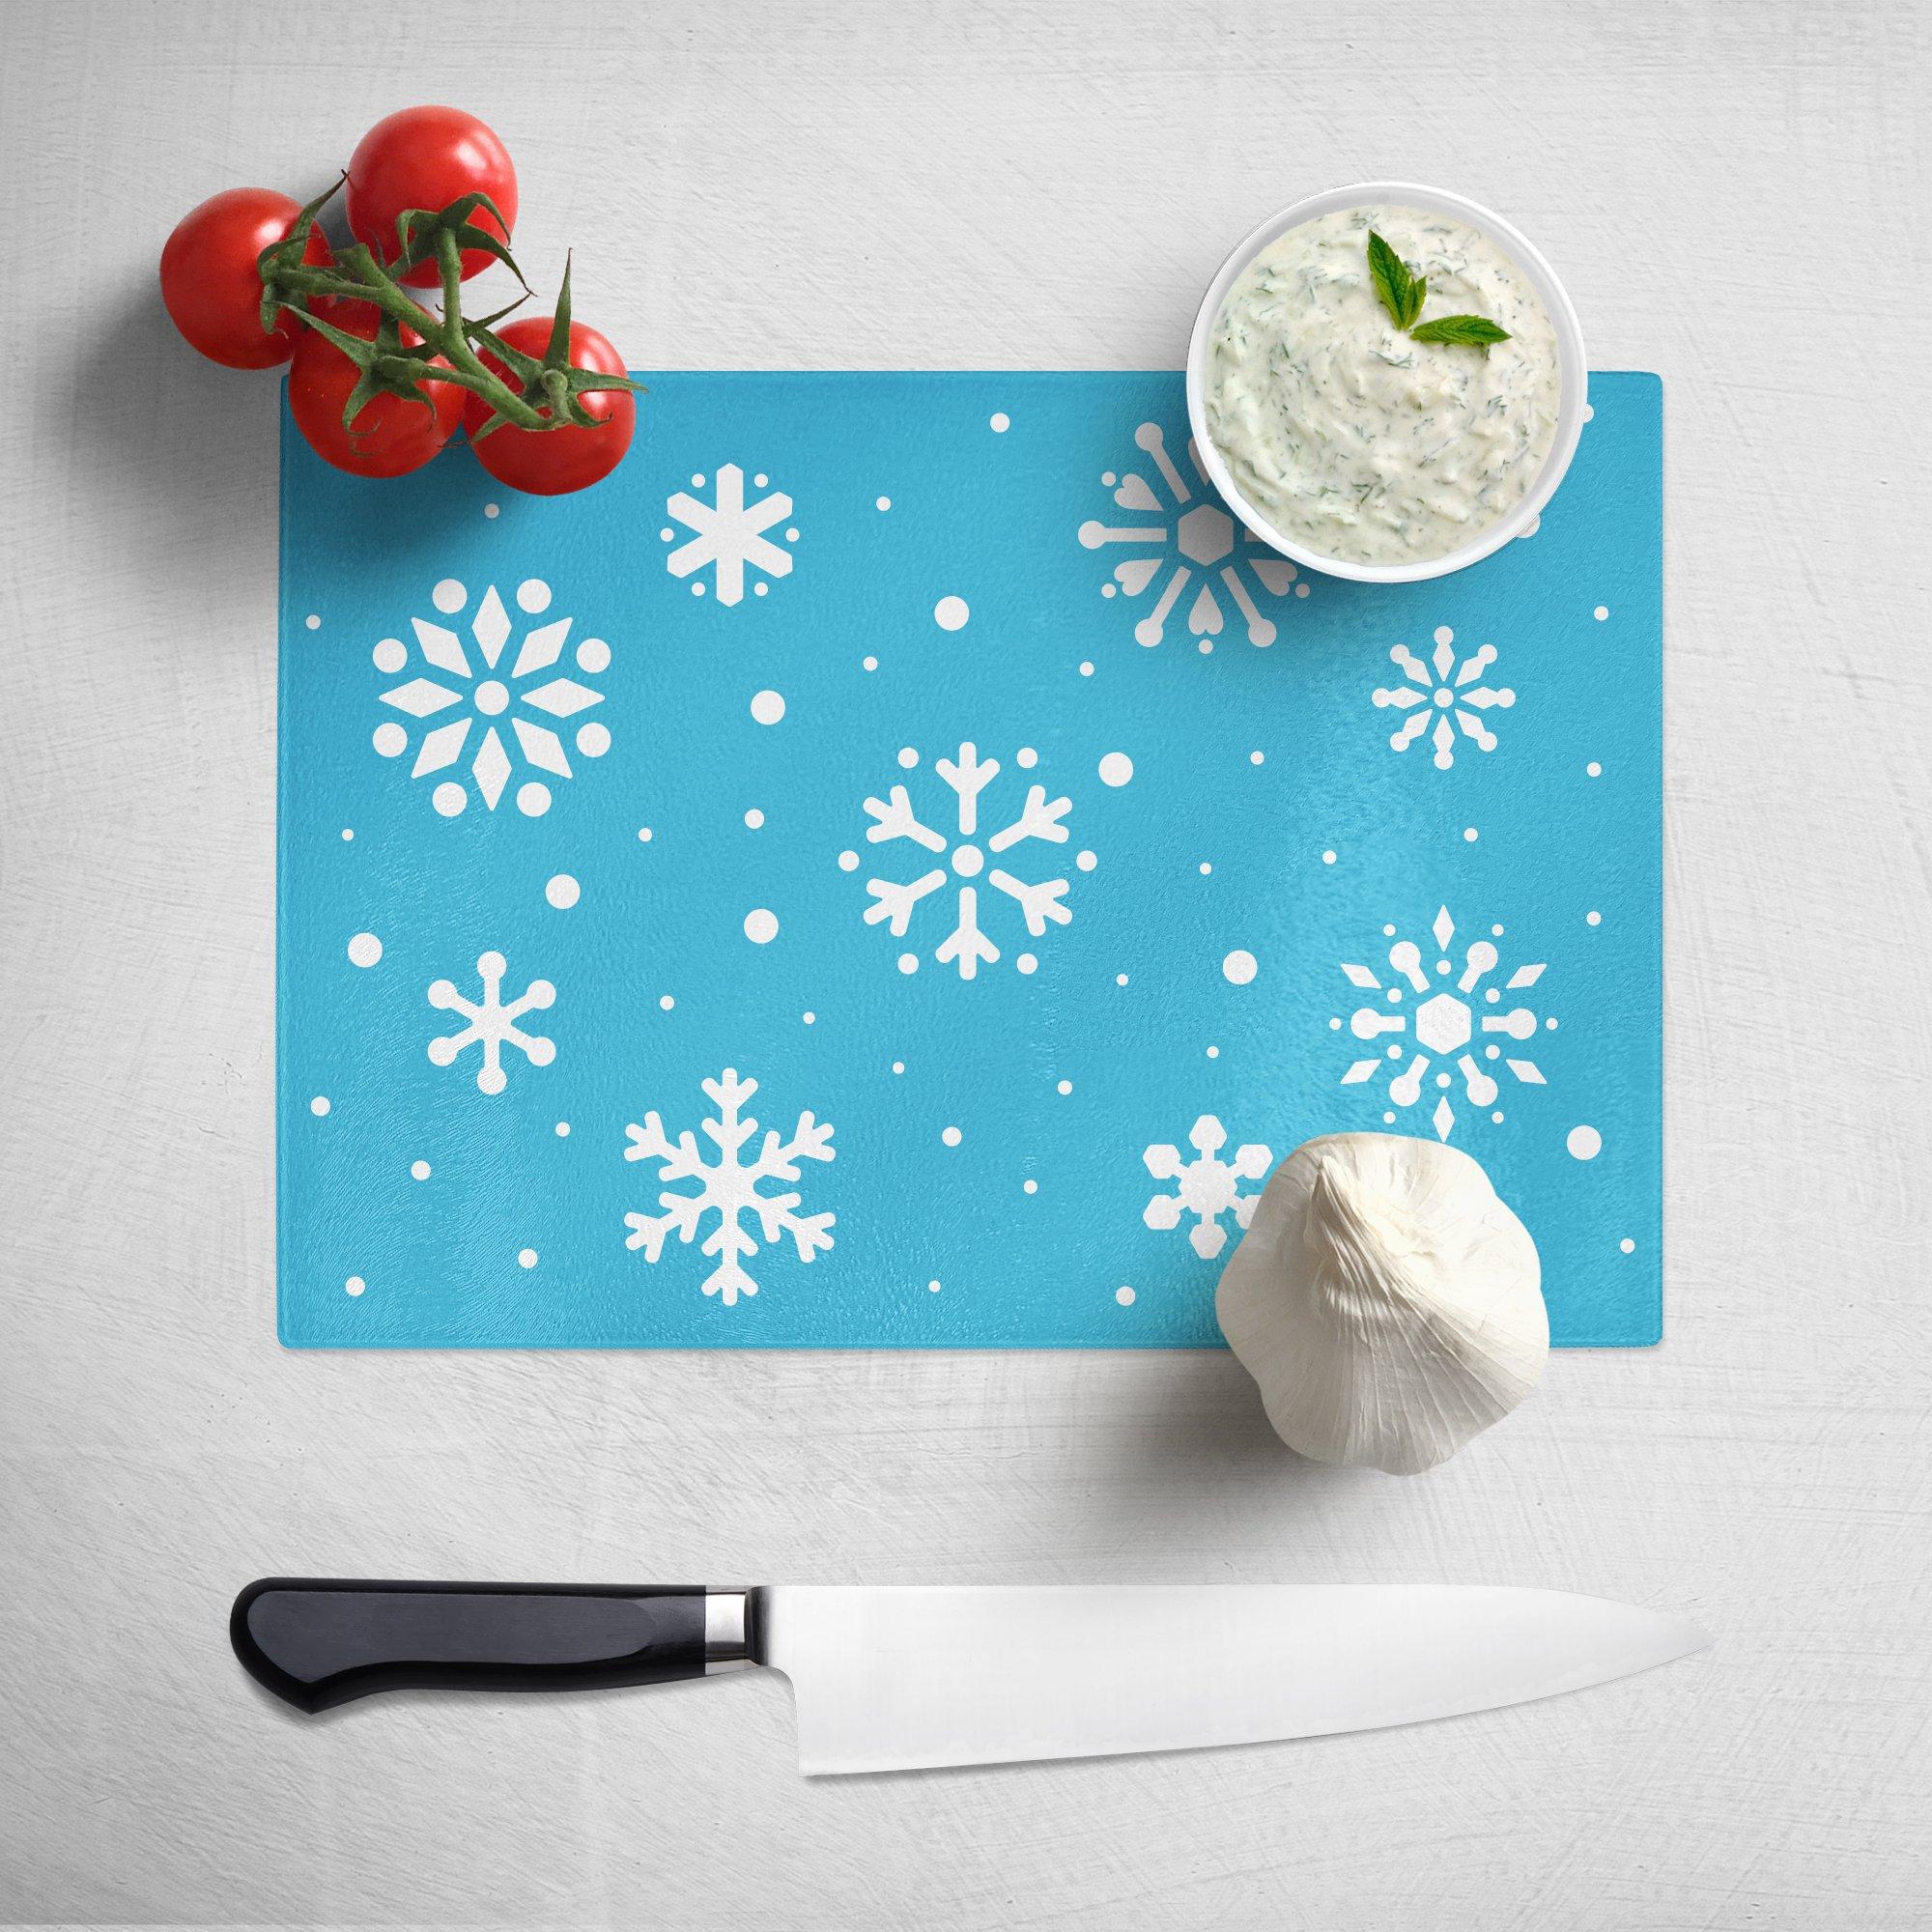 Cutting Board Corporate Gift Idea